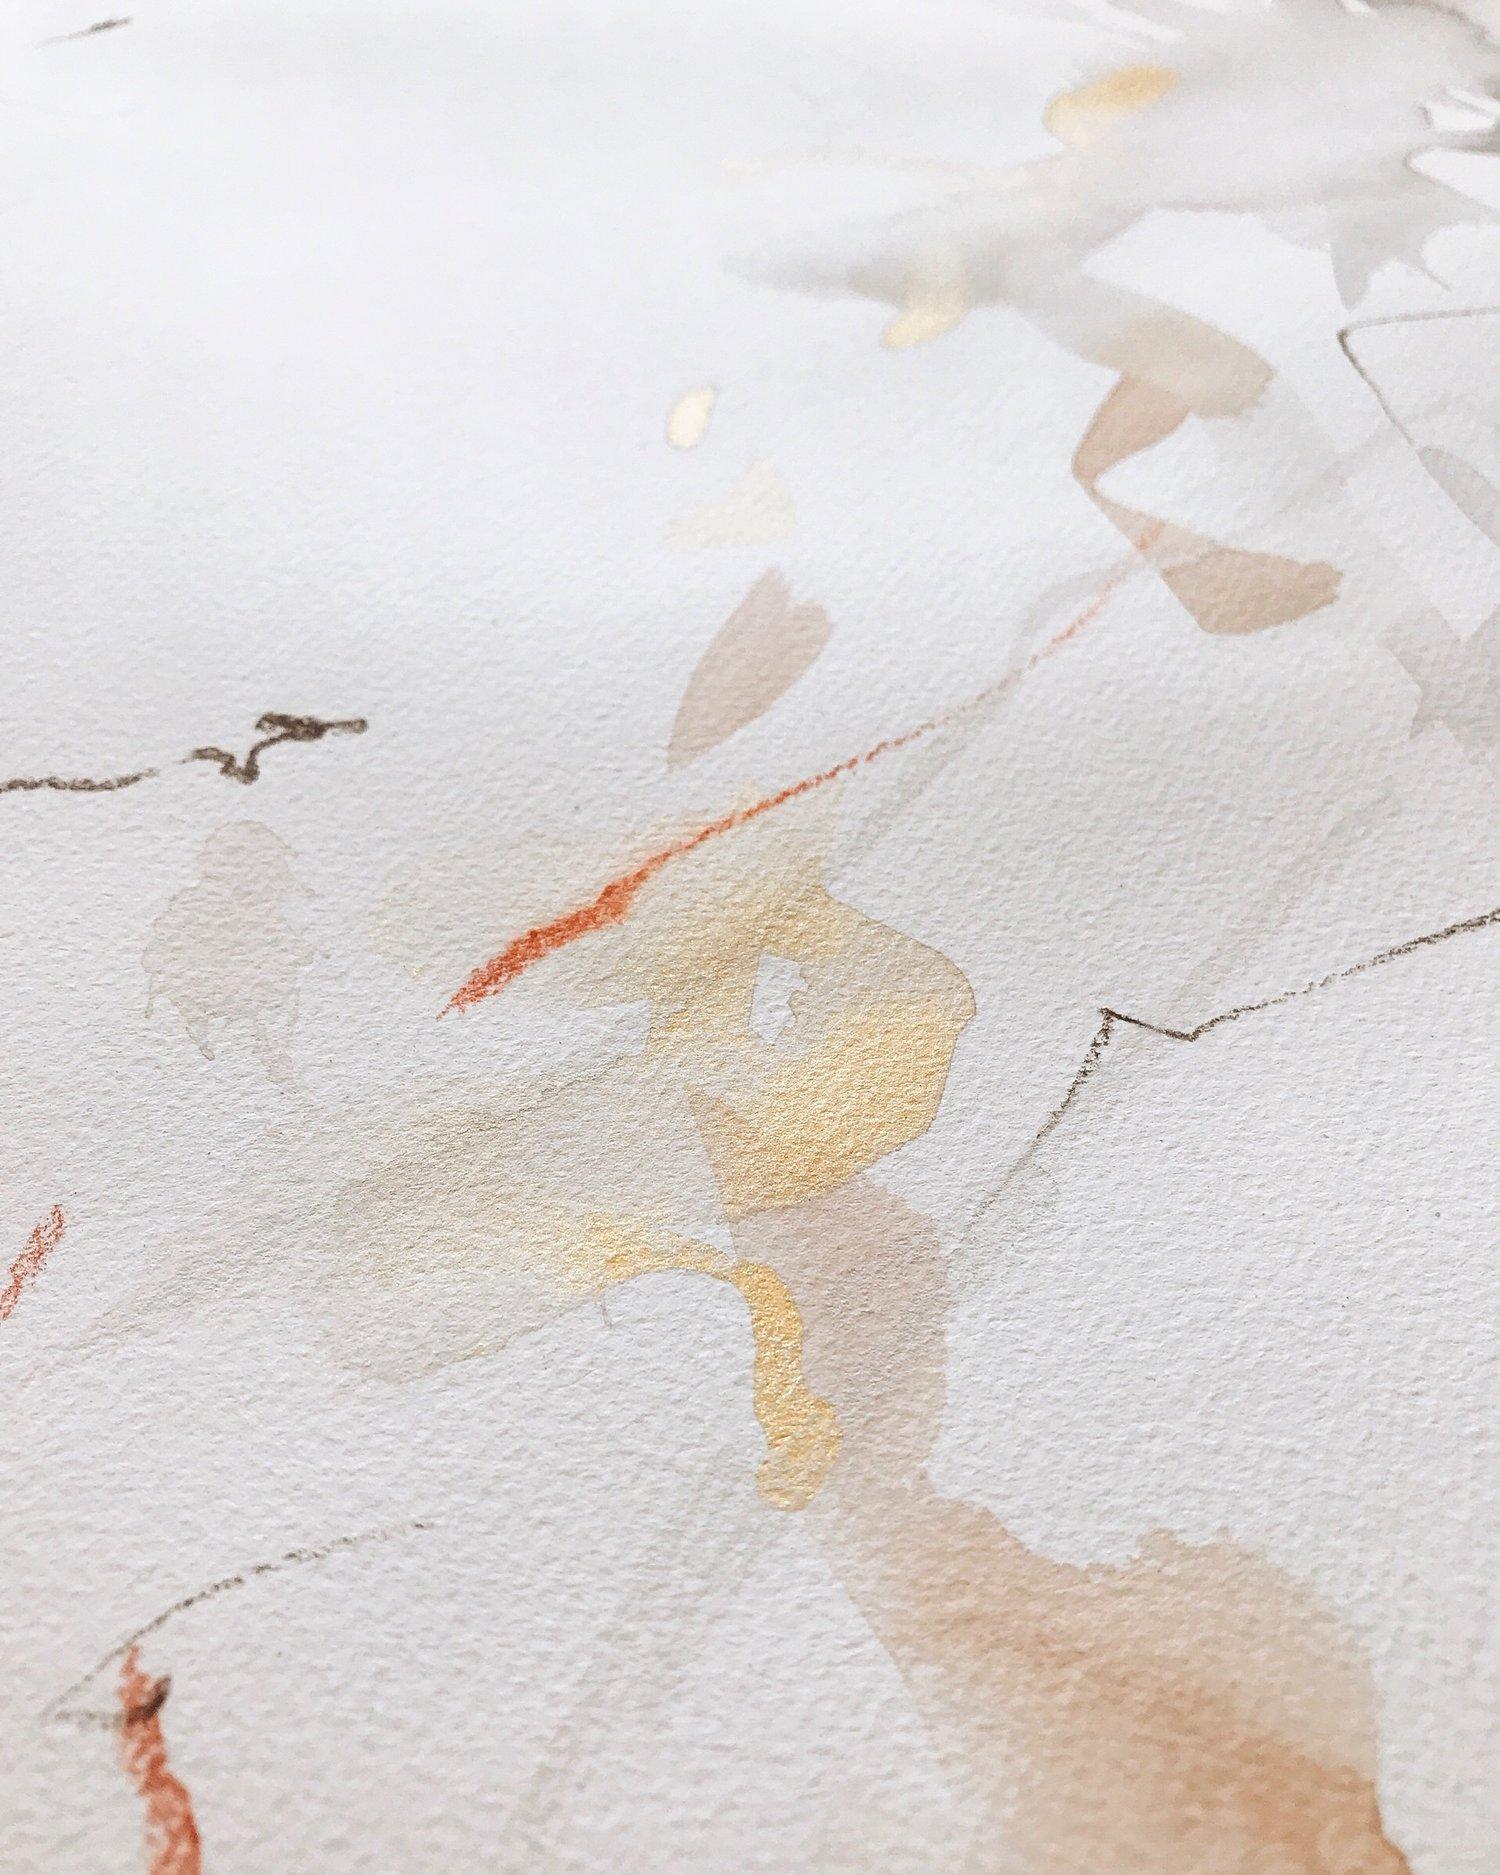 Poetry — Satsuki Shibuya